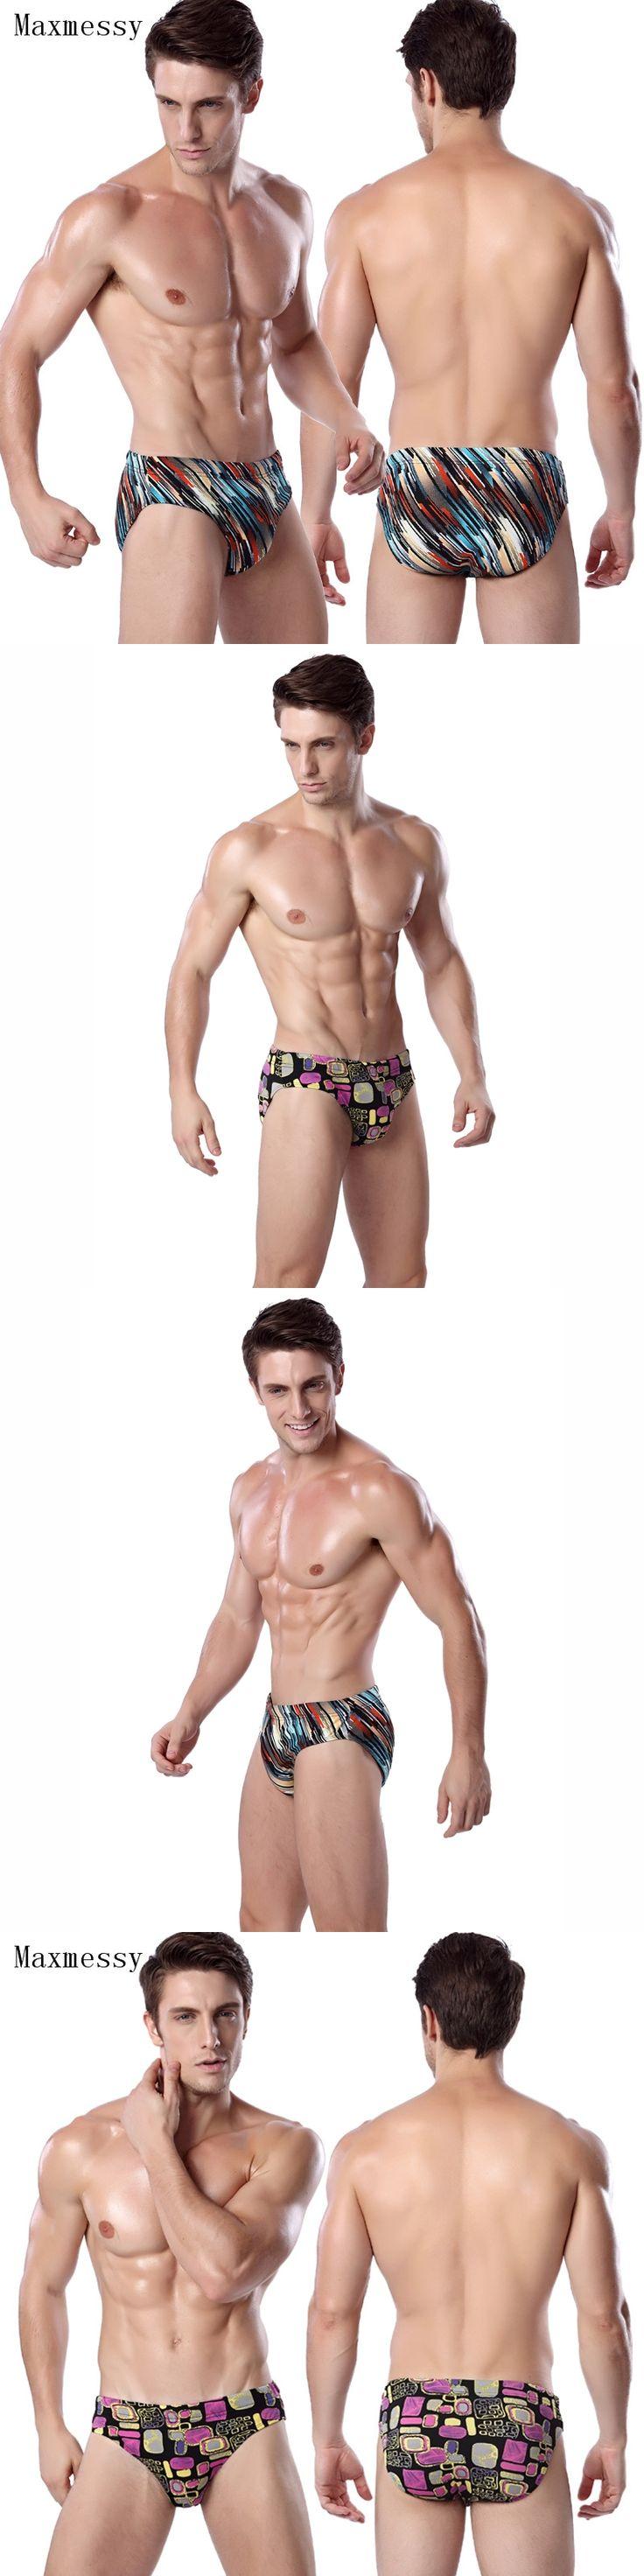 Maxmessy Men's Swimming Briefs Shorts Swimming Trunks Swimwear Swimsuit Water Repellent Man Swimwear Men Swim Suit Underpants